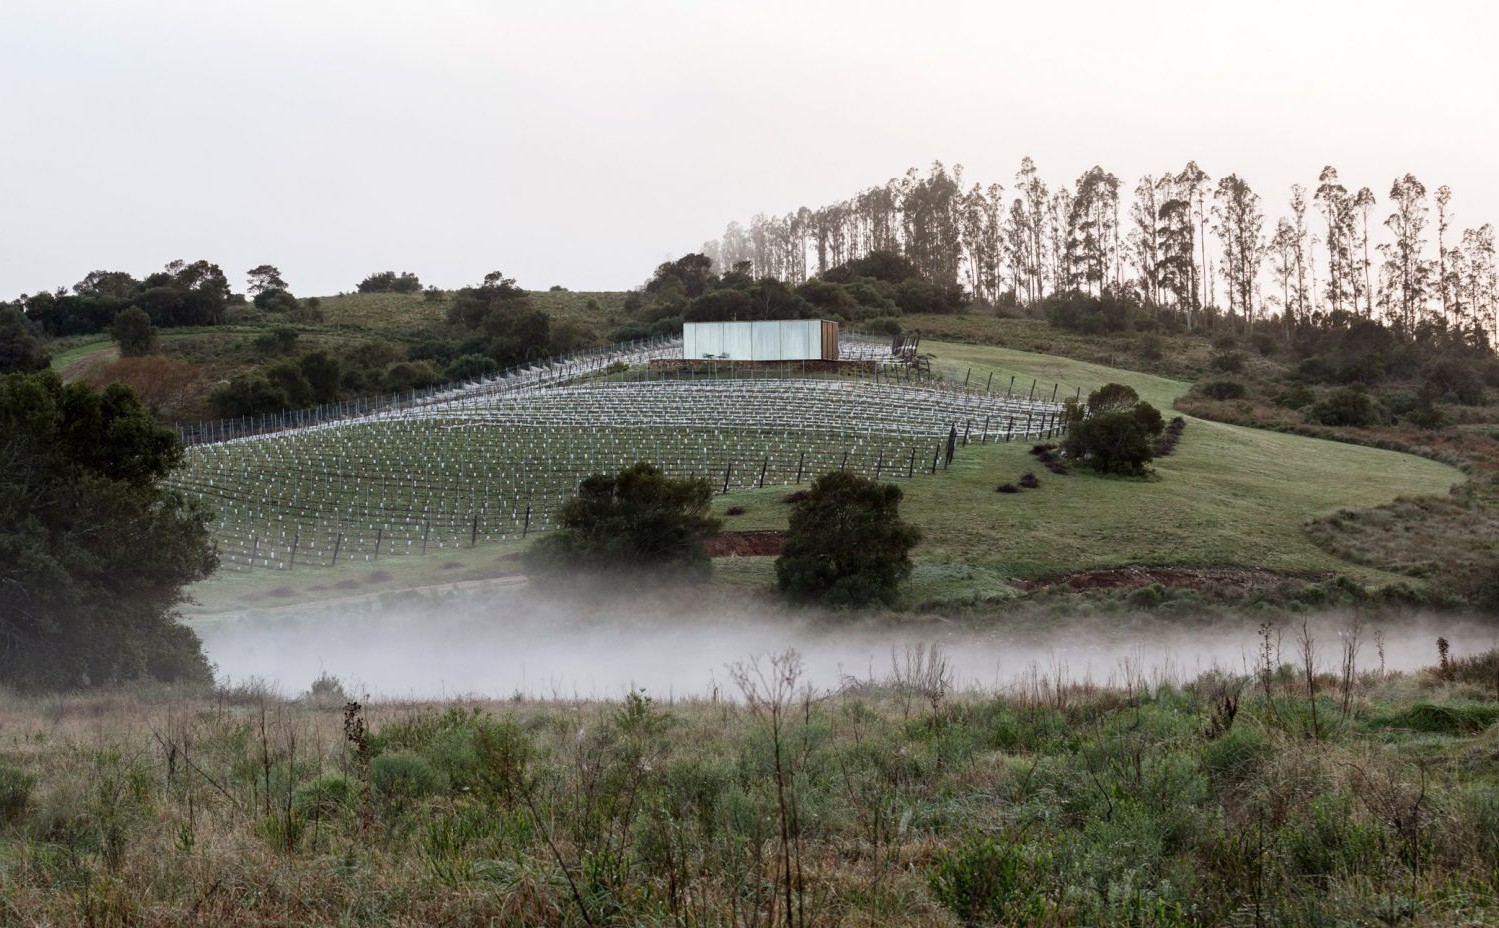 sacromonte-landscape-shelters-mapa-architecture-hotels-uruguay-prefabricated_dezeen_2364_col_12-1704x1128